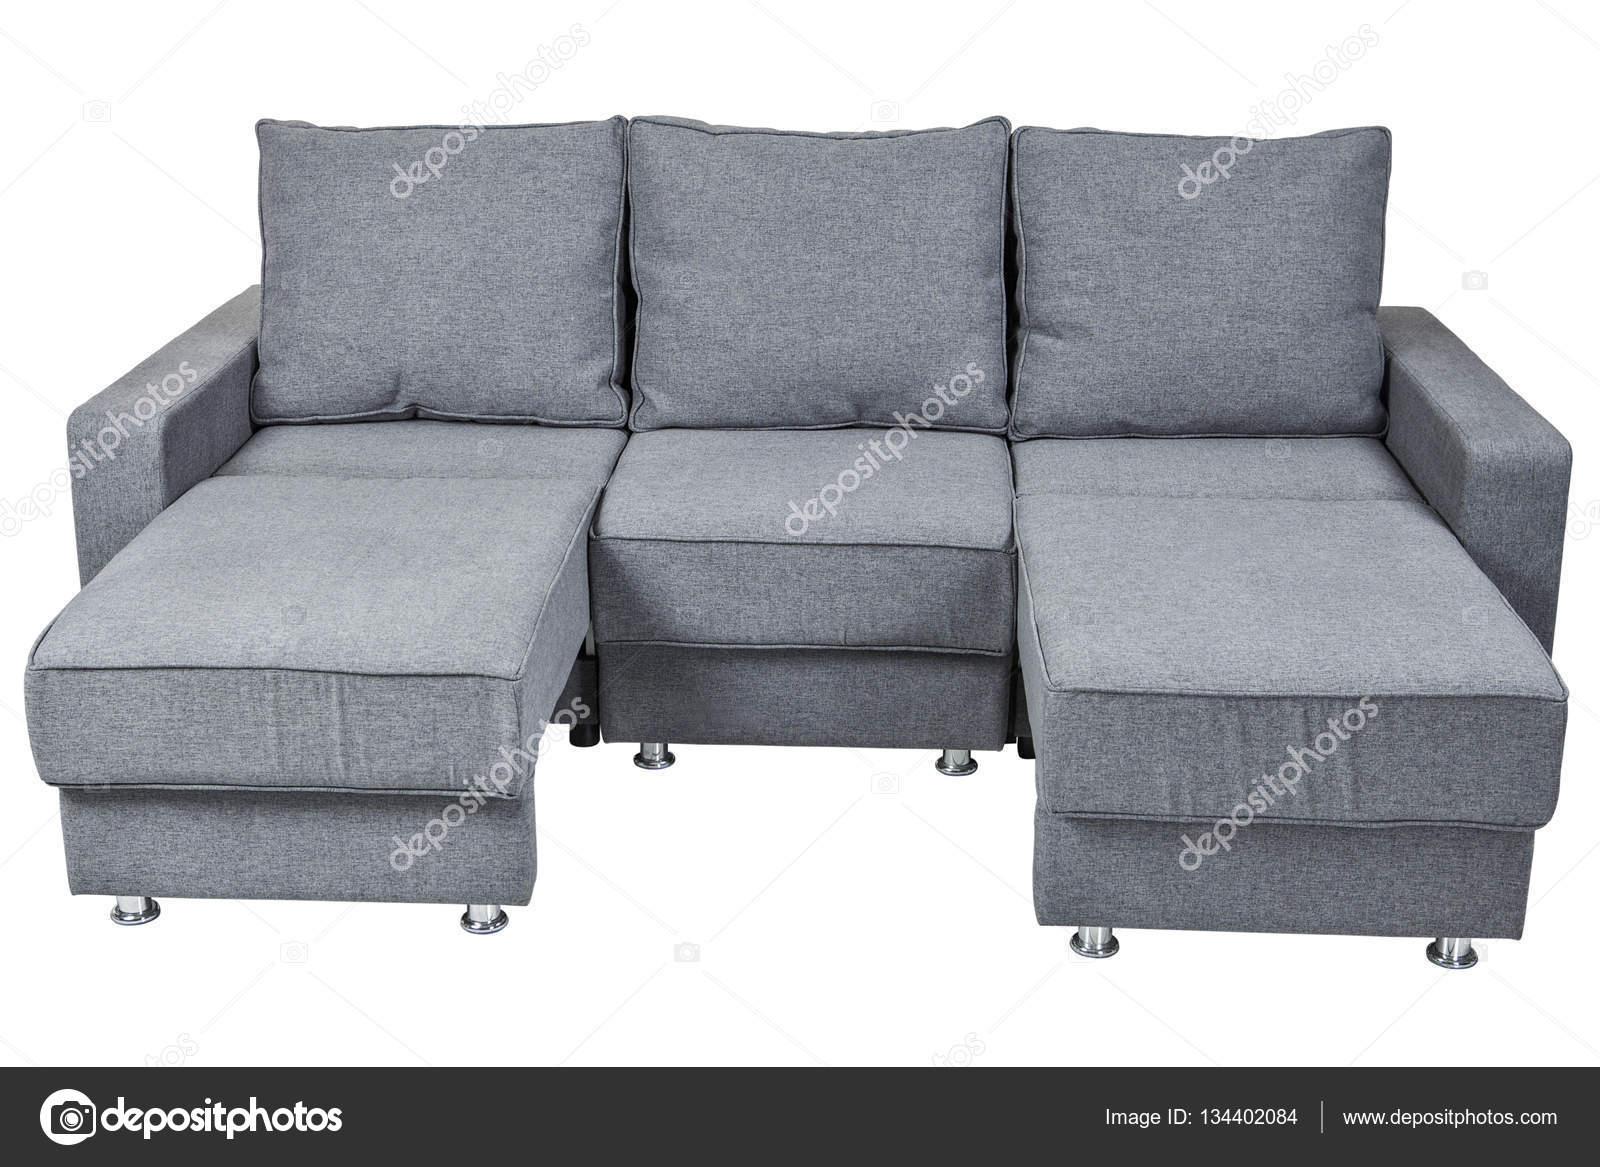 Stoff-Sofa-Bett mit Farbe grau — Stockfoto © grigvovan #134402084